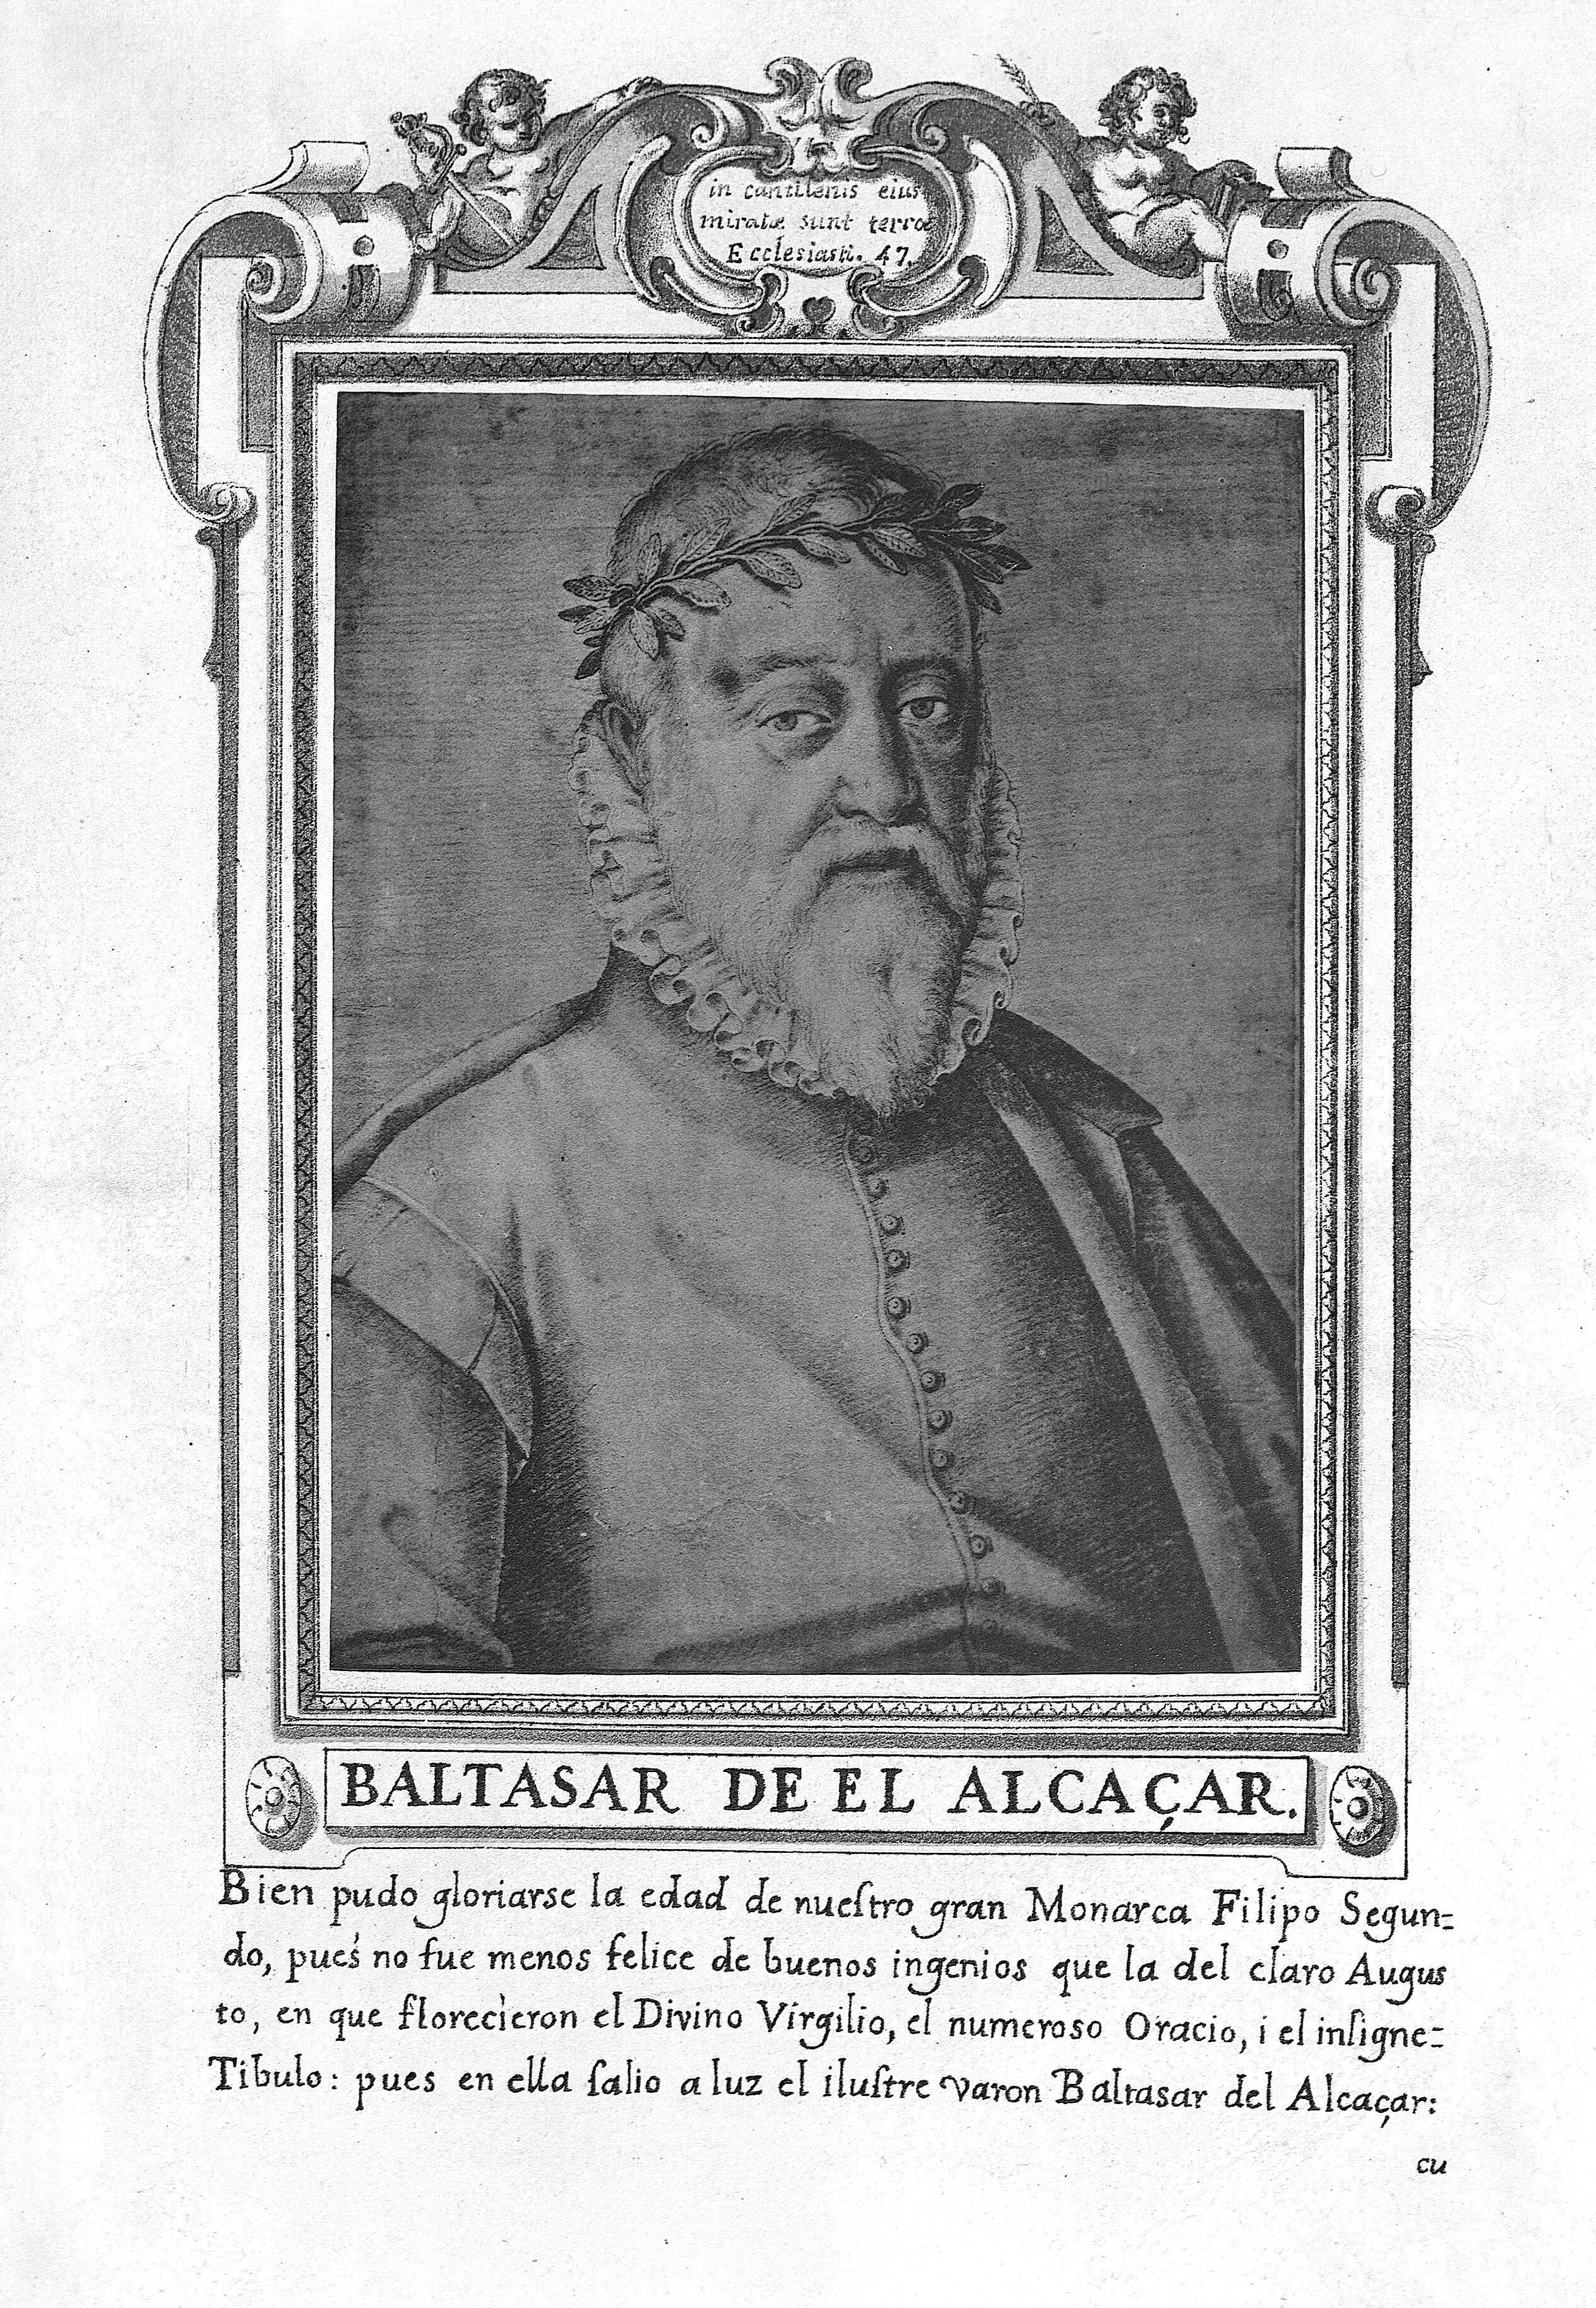 Baltasar del Alcazar wikipedia